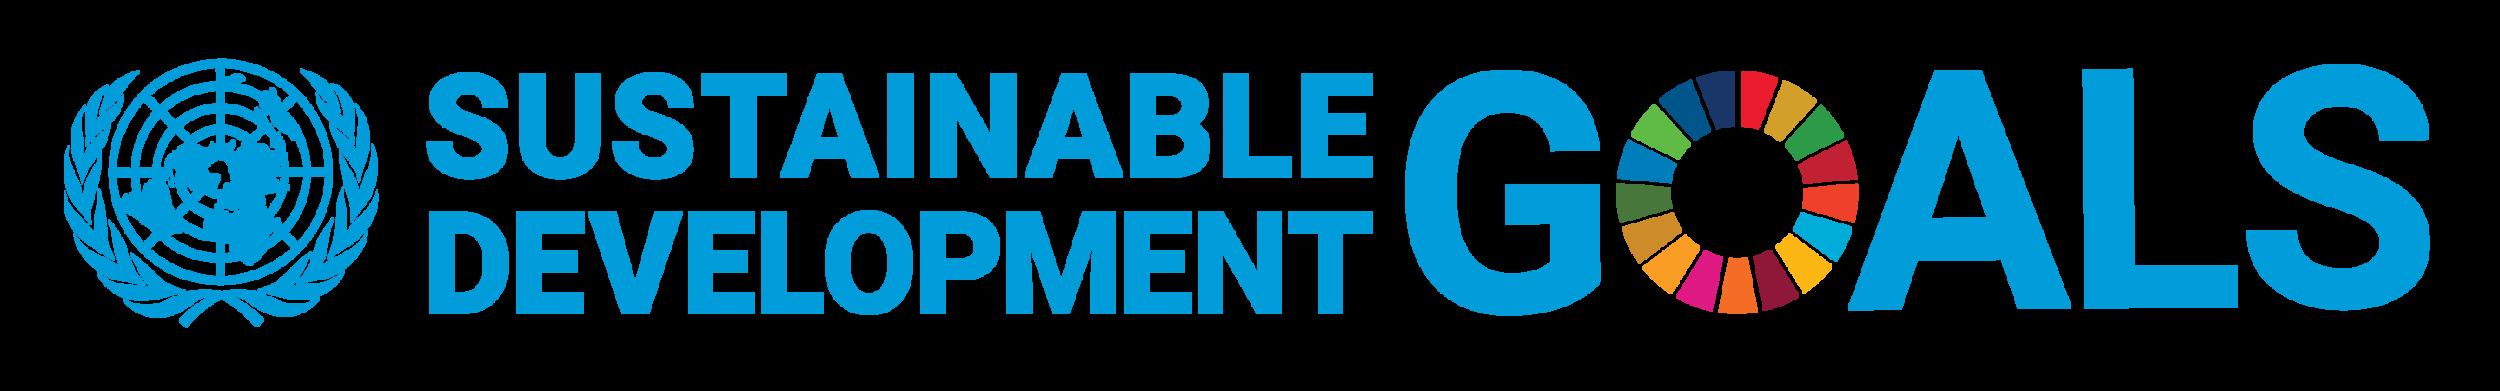 SDG logo with UN Emblem_Horizontal Web_transparent.png